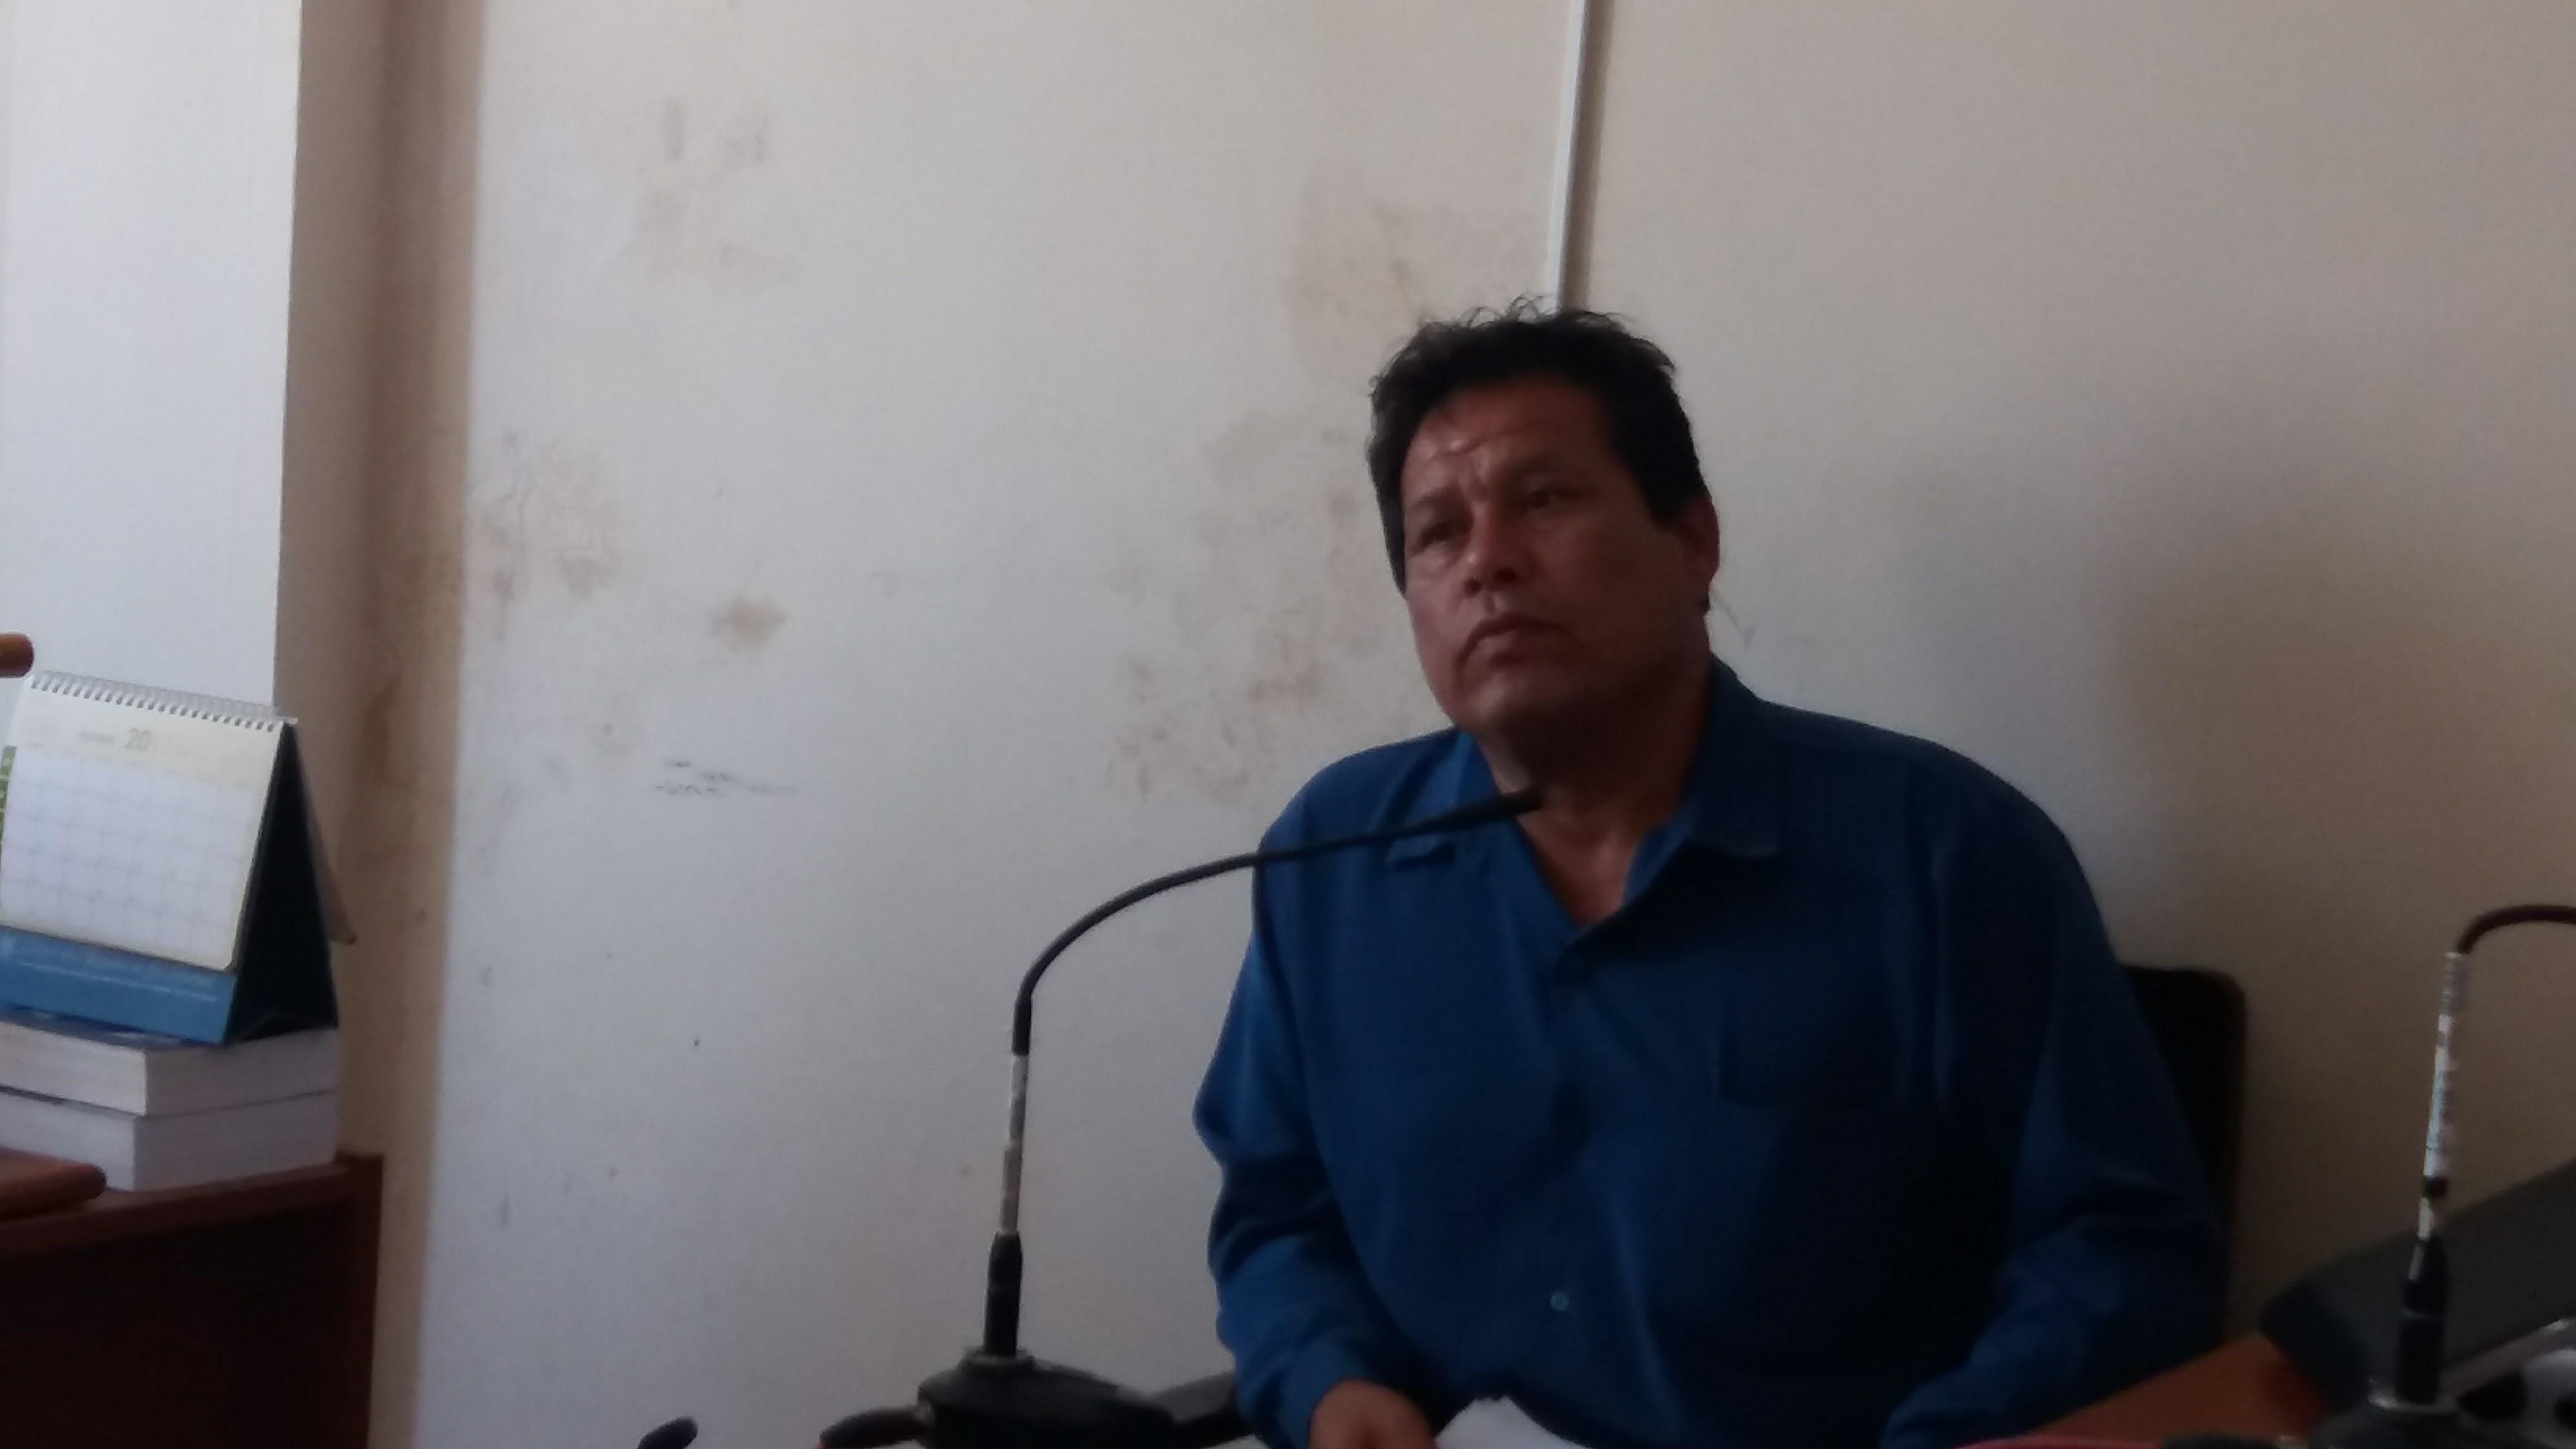 juez-de-paz-jequetepeque-juicio-25-octubre-2017.jpg?mtime=20171026002933#asset:72868